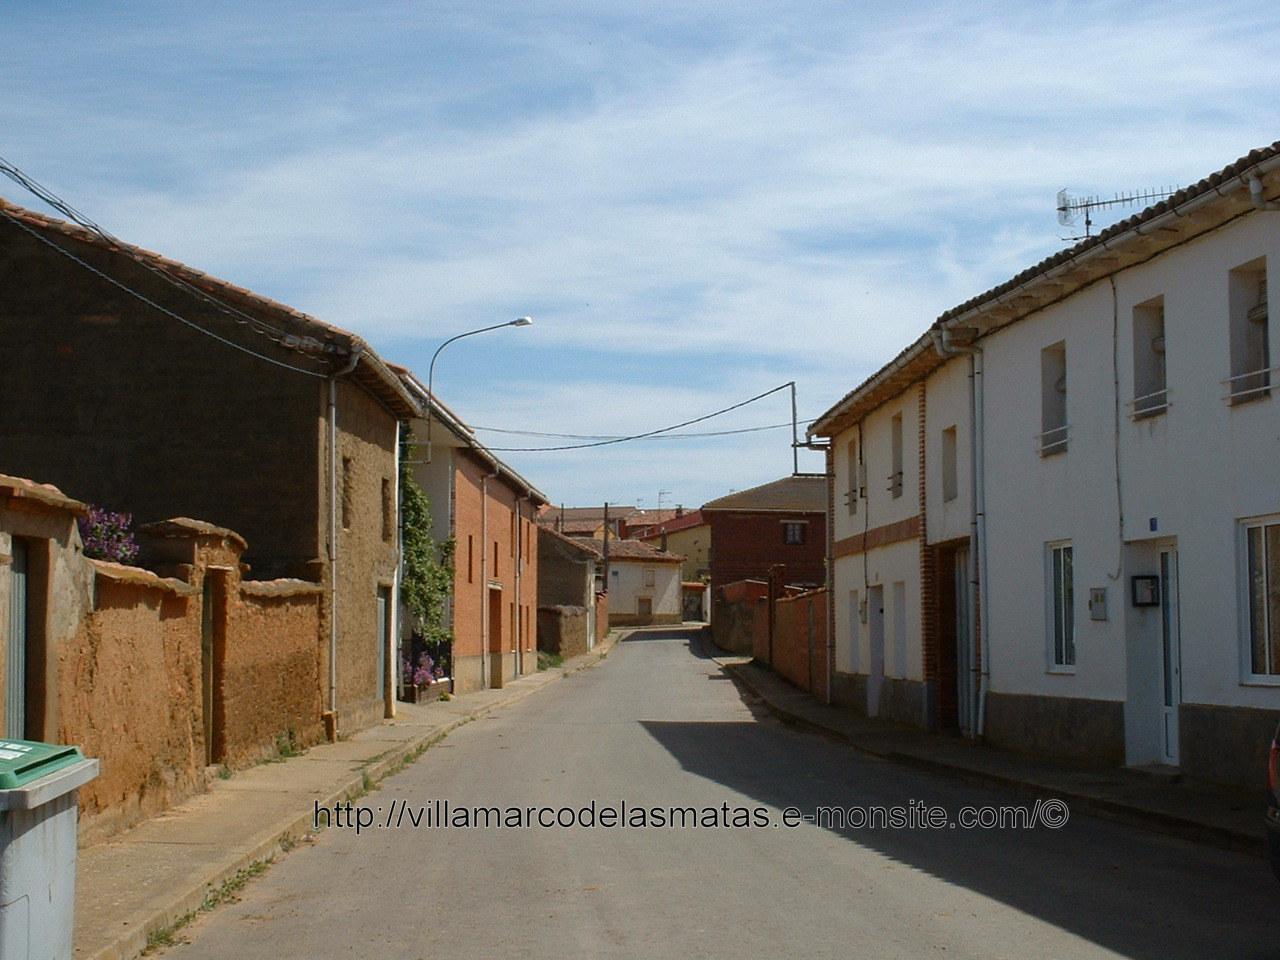 Calle Burona